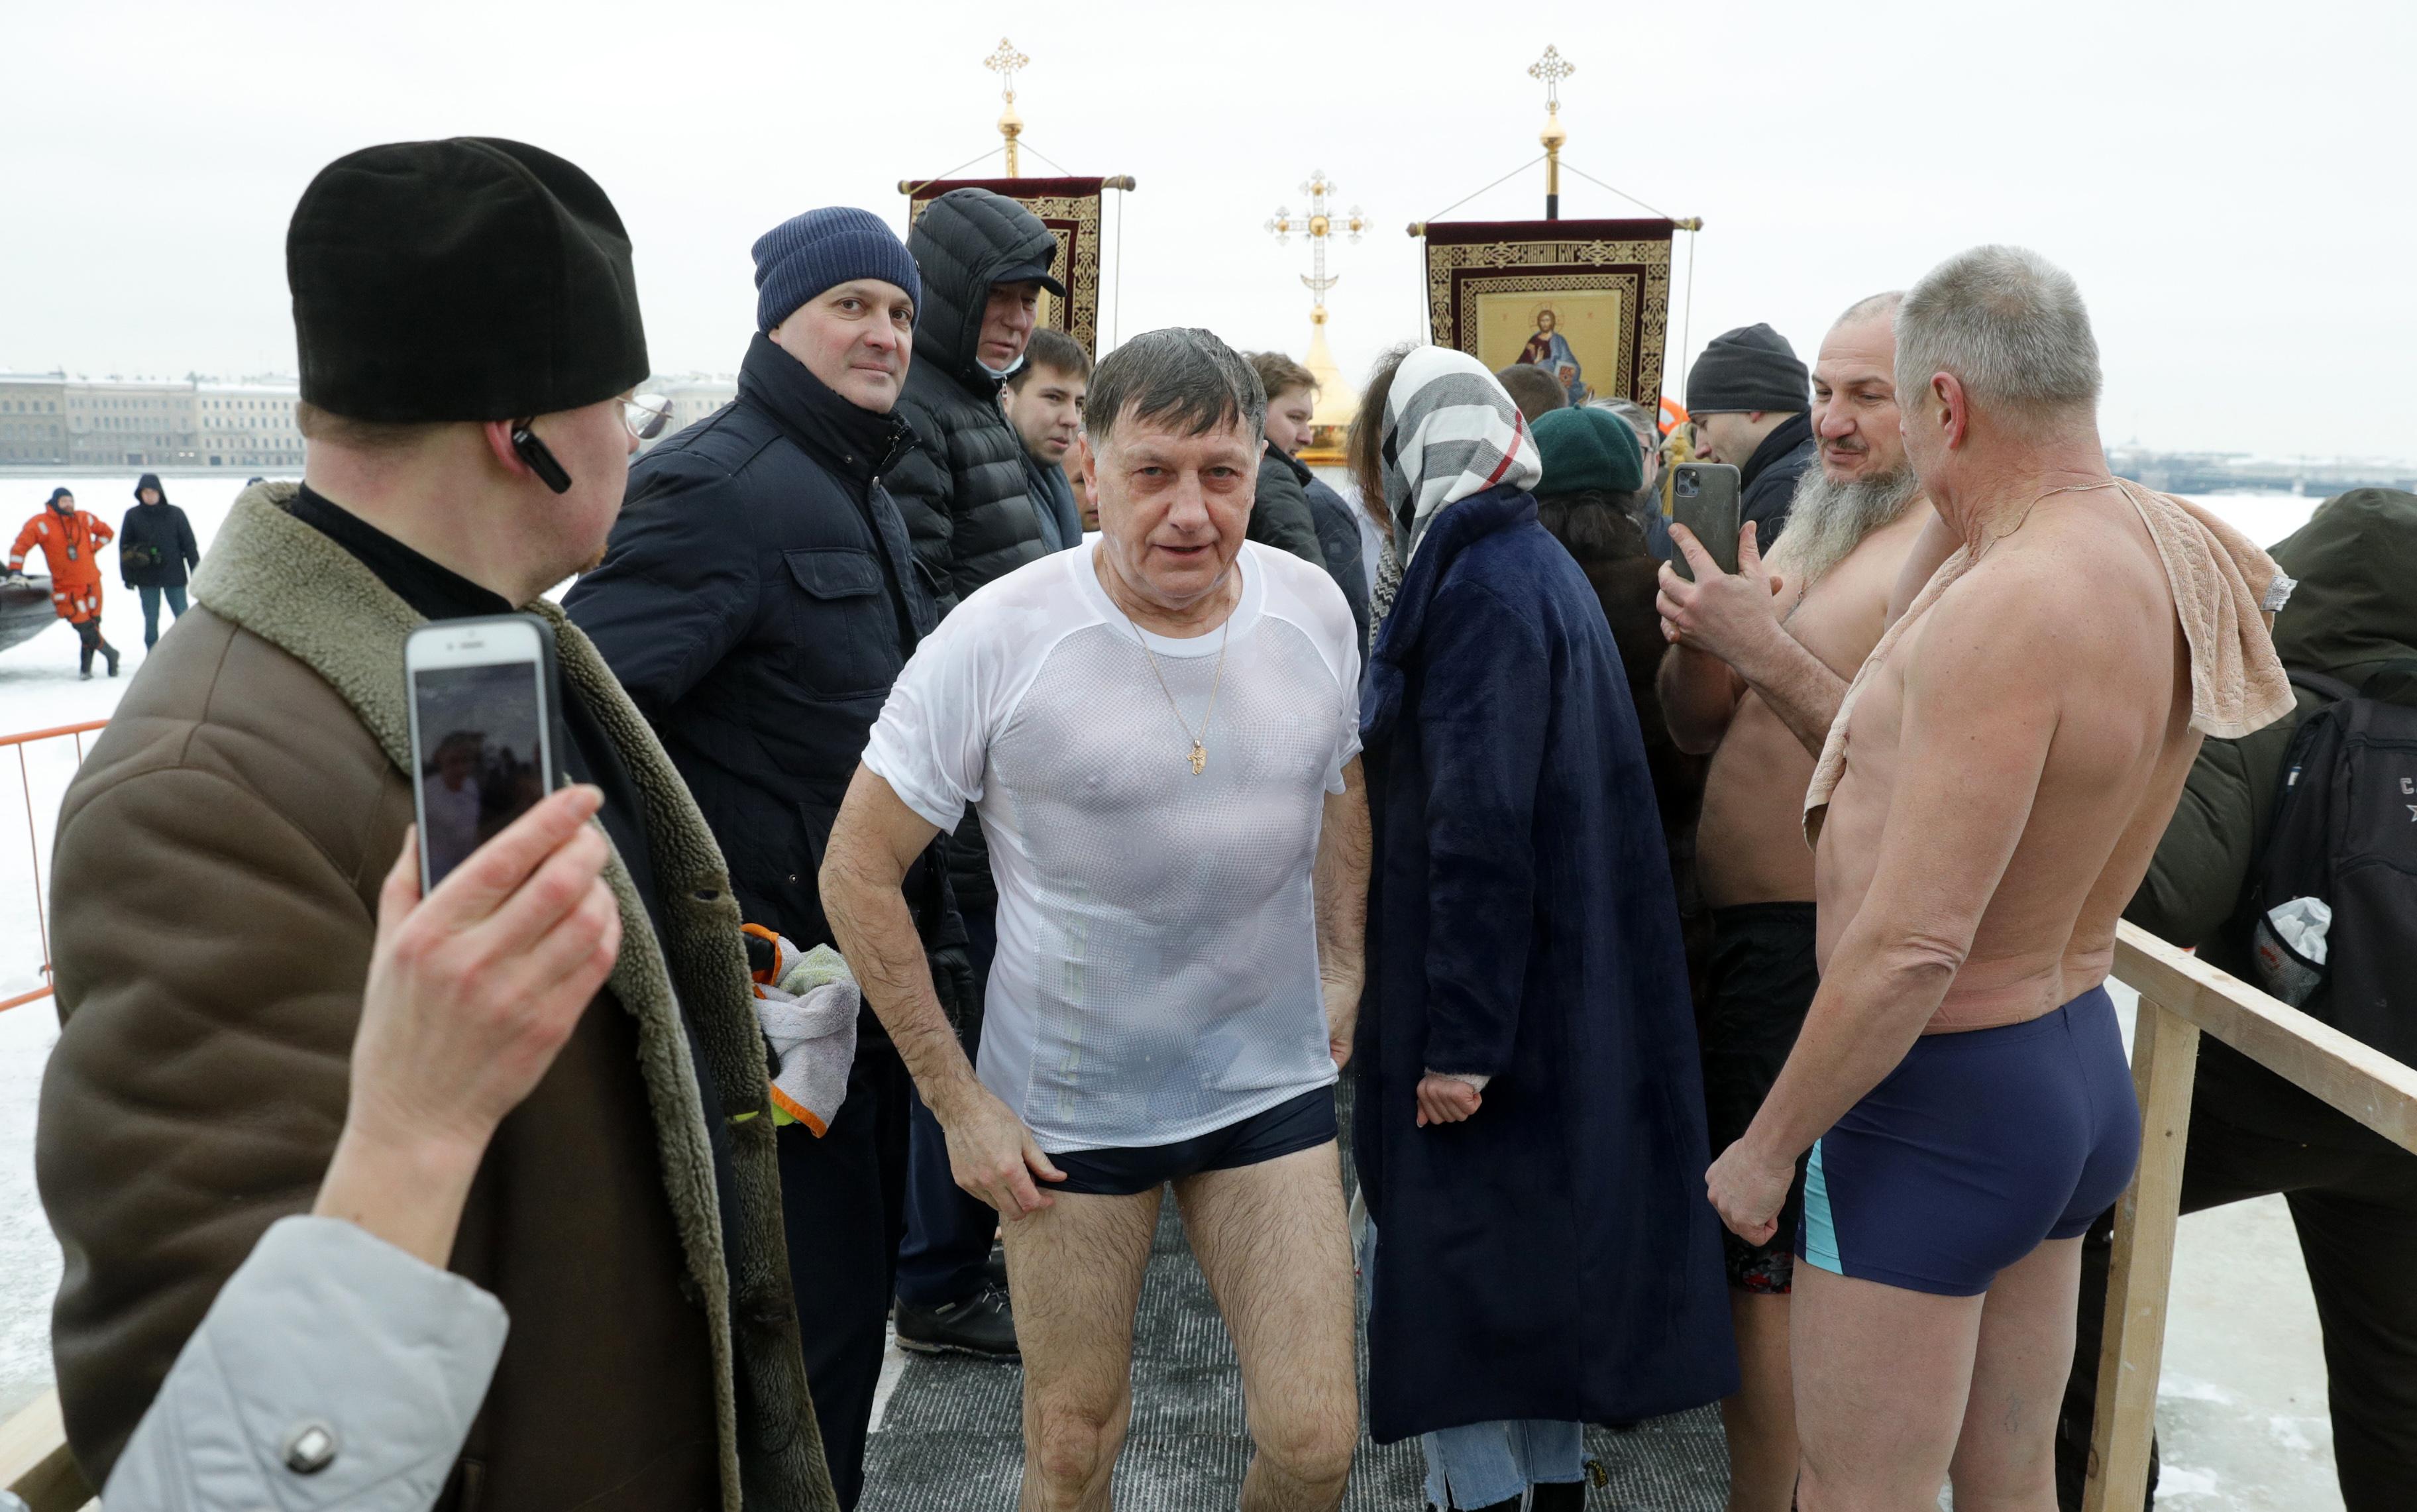 фото ЗакС политика Макаров отметил Крещение, искупавшись в проруби